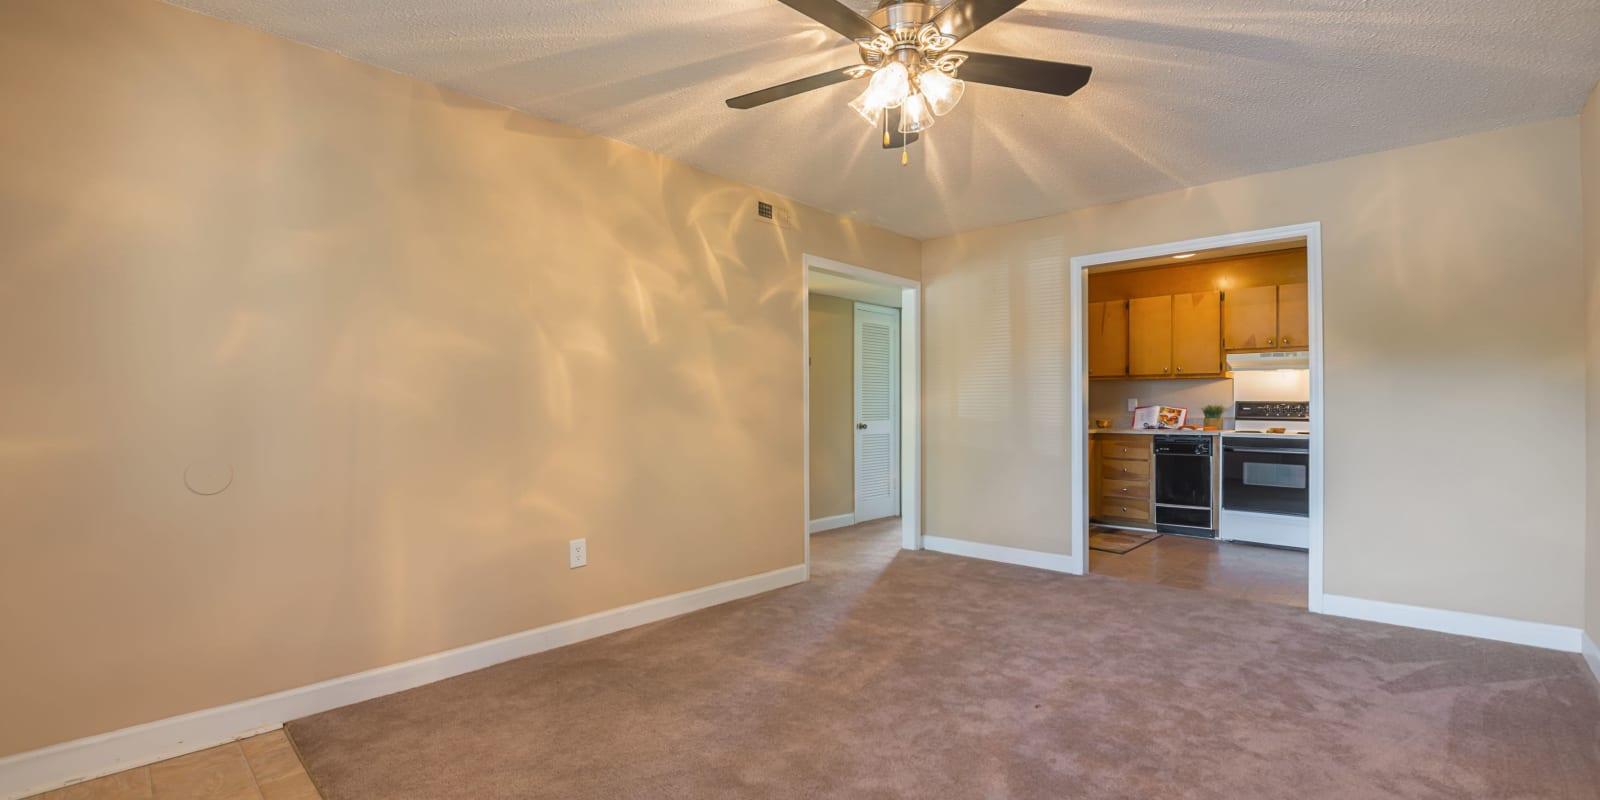 Living room with plush carpeting at Lakewood Apartment Homes in Salisbury, North Carolina